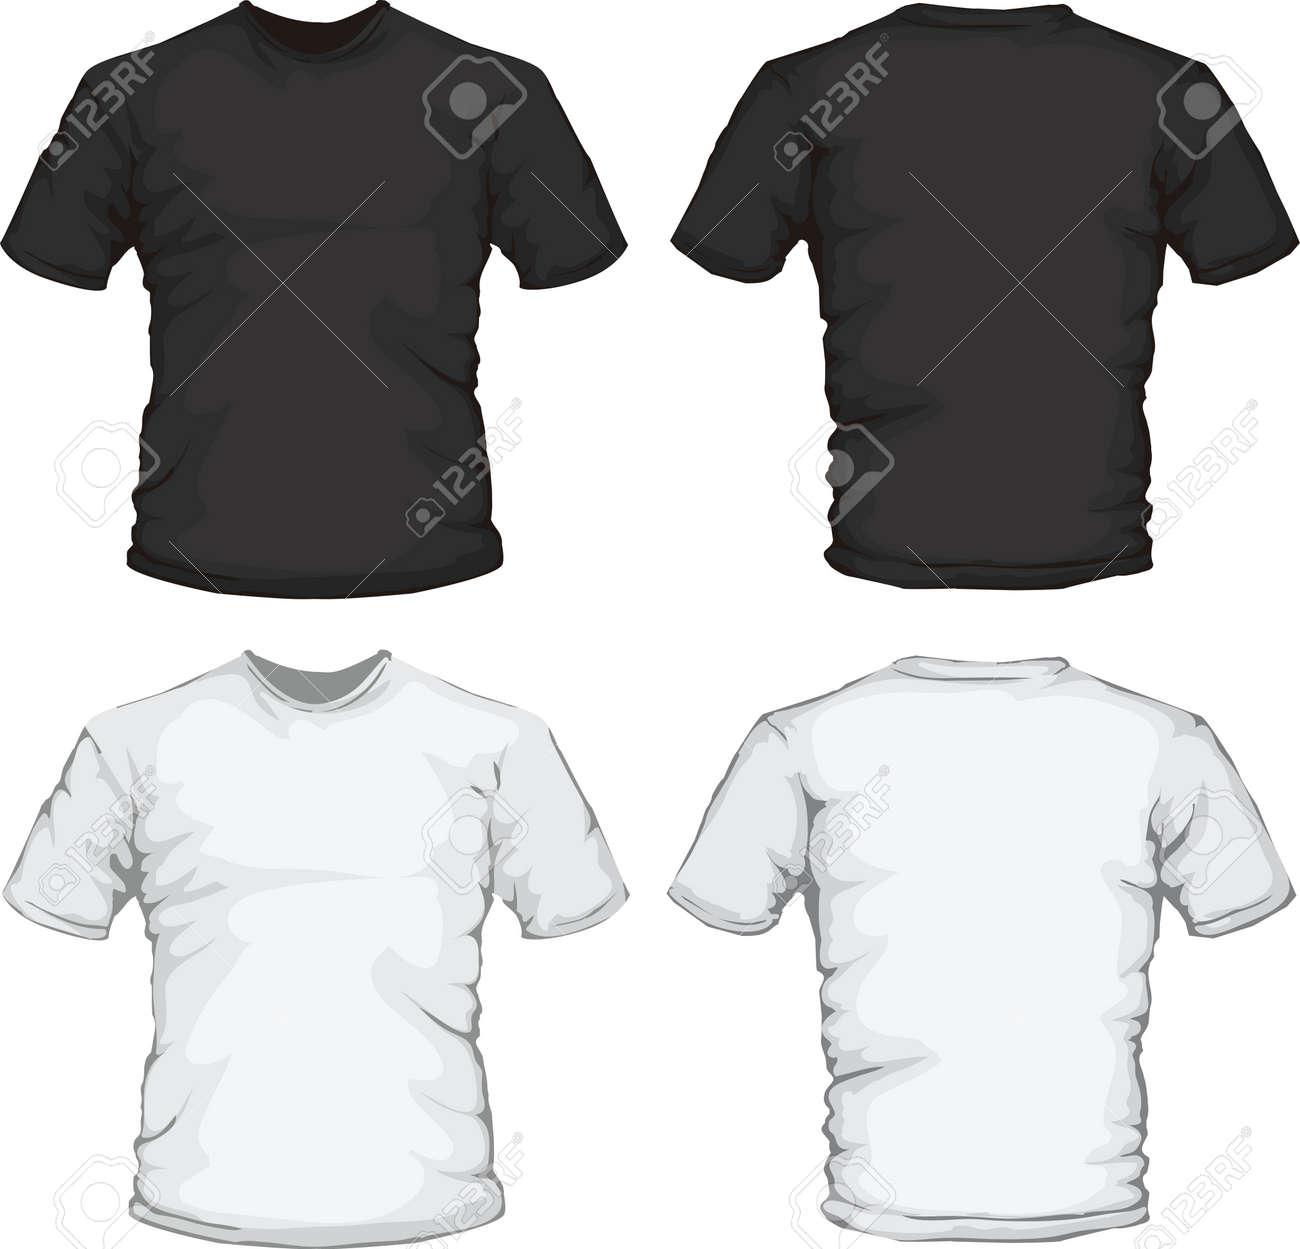 Shirt design white - Vector Vector Illustration Of Black And White Male Shirt Design Template